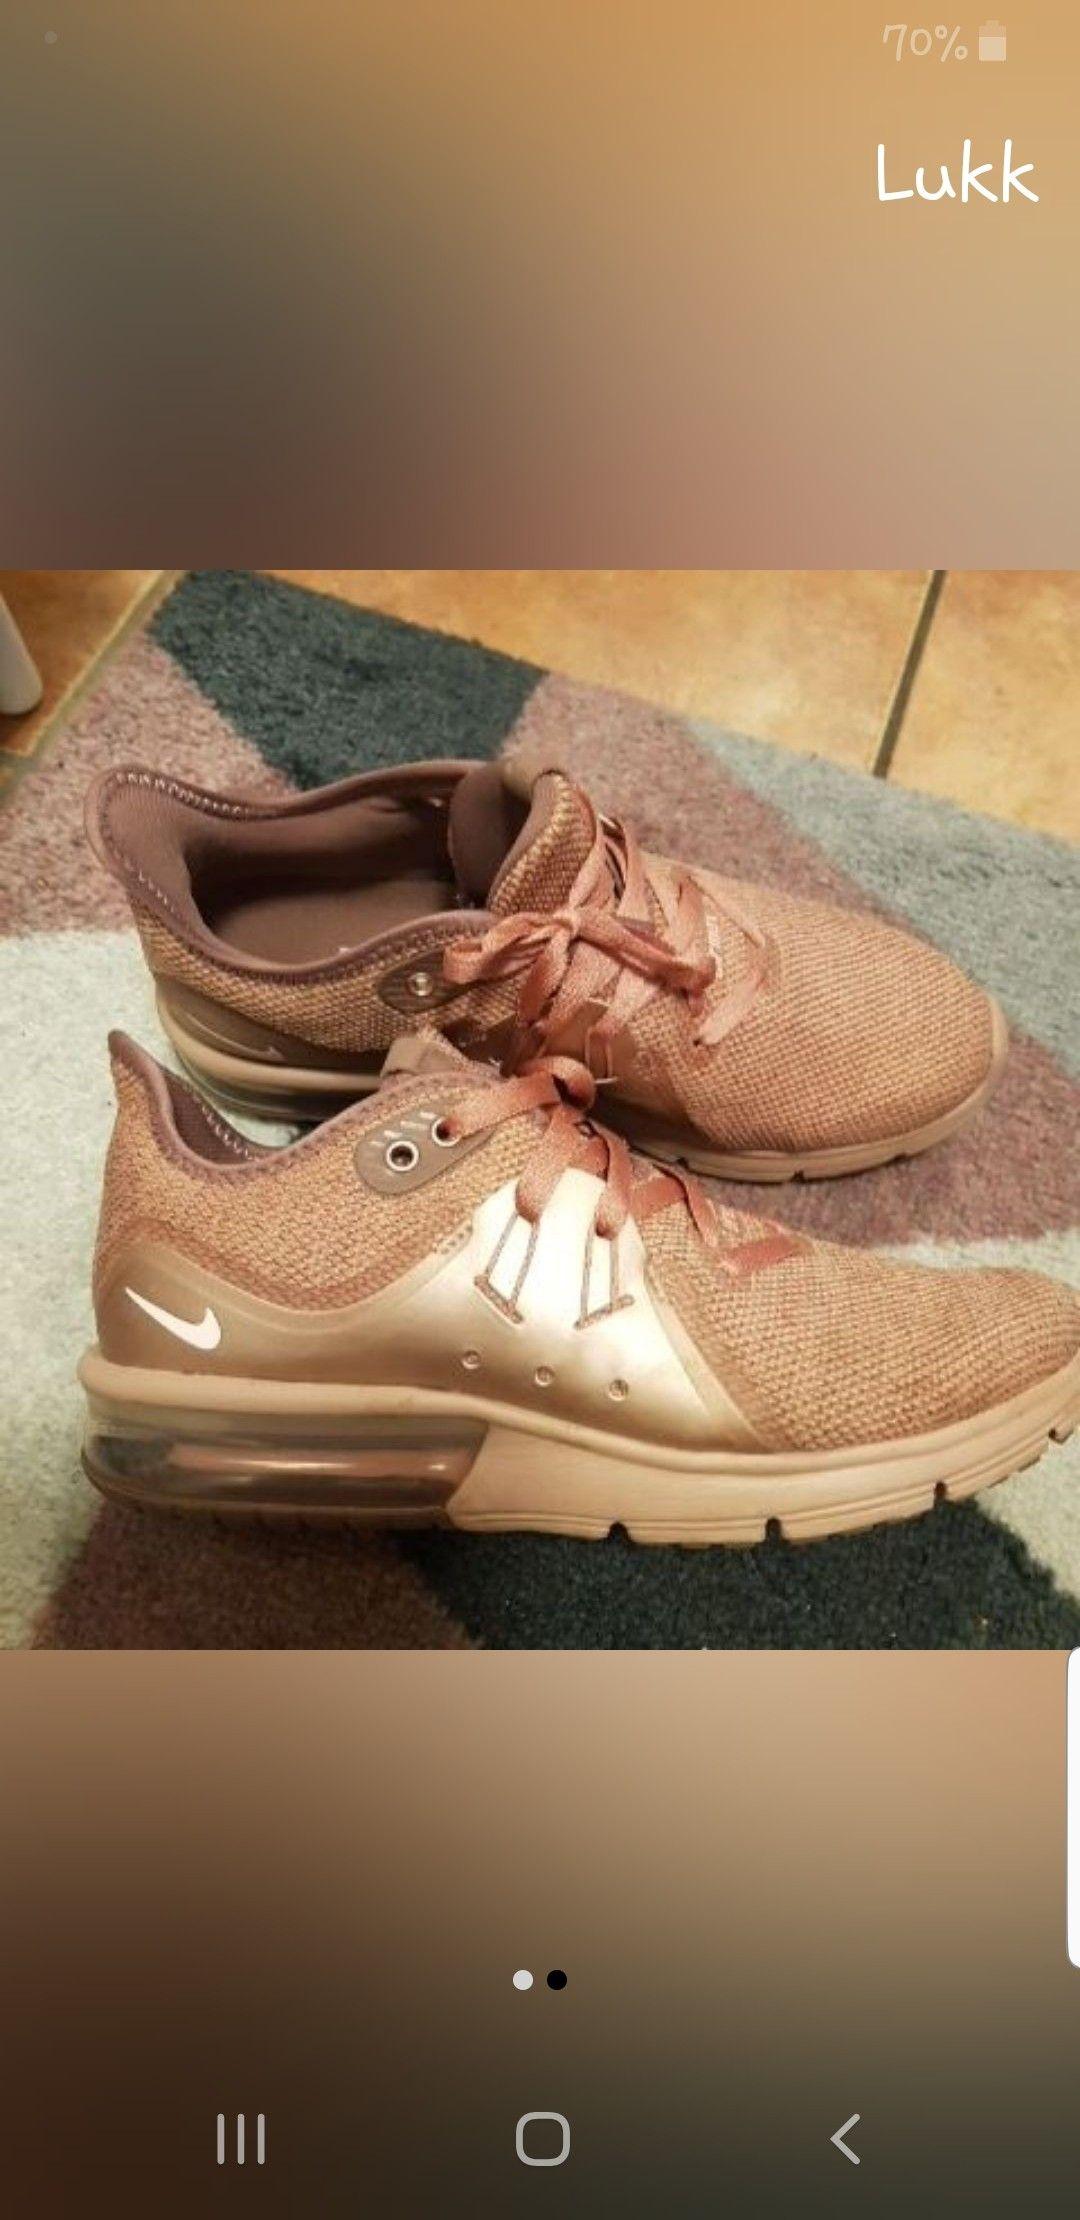 Div. nye Nike sko | FINN.no